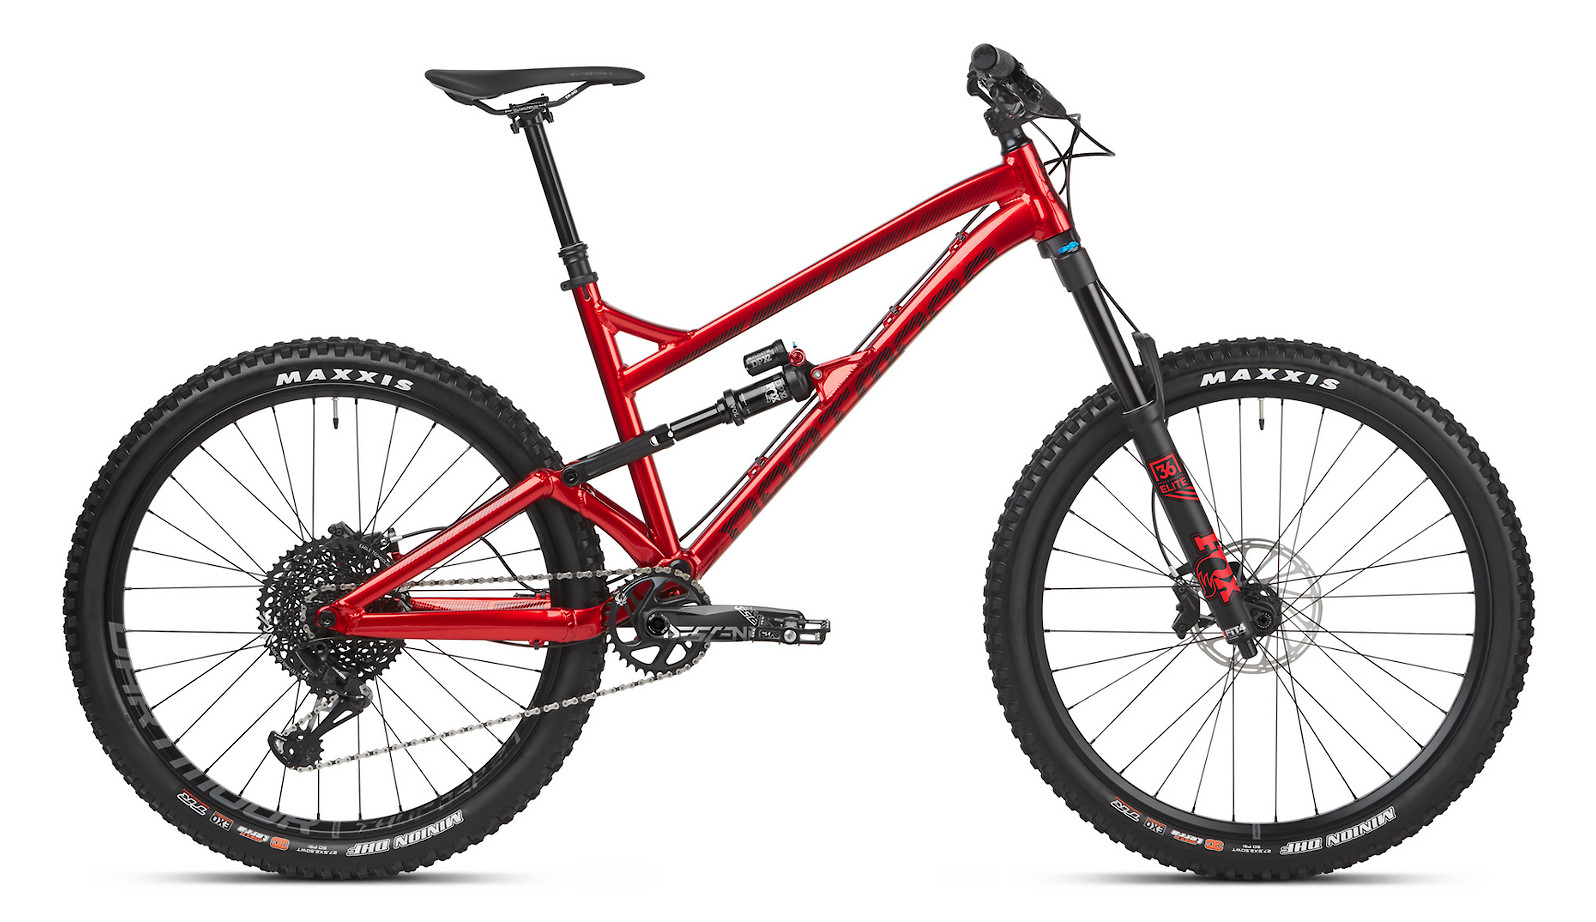 2019 Dartmoor Blackbird Pro 27.5 Bike